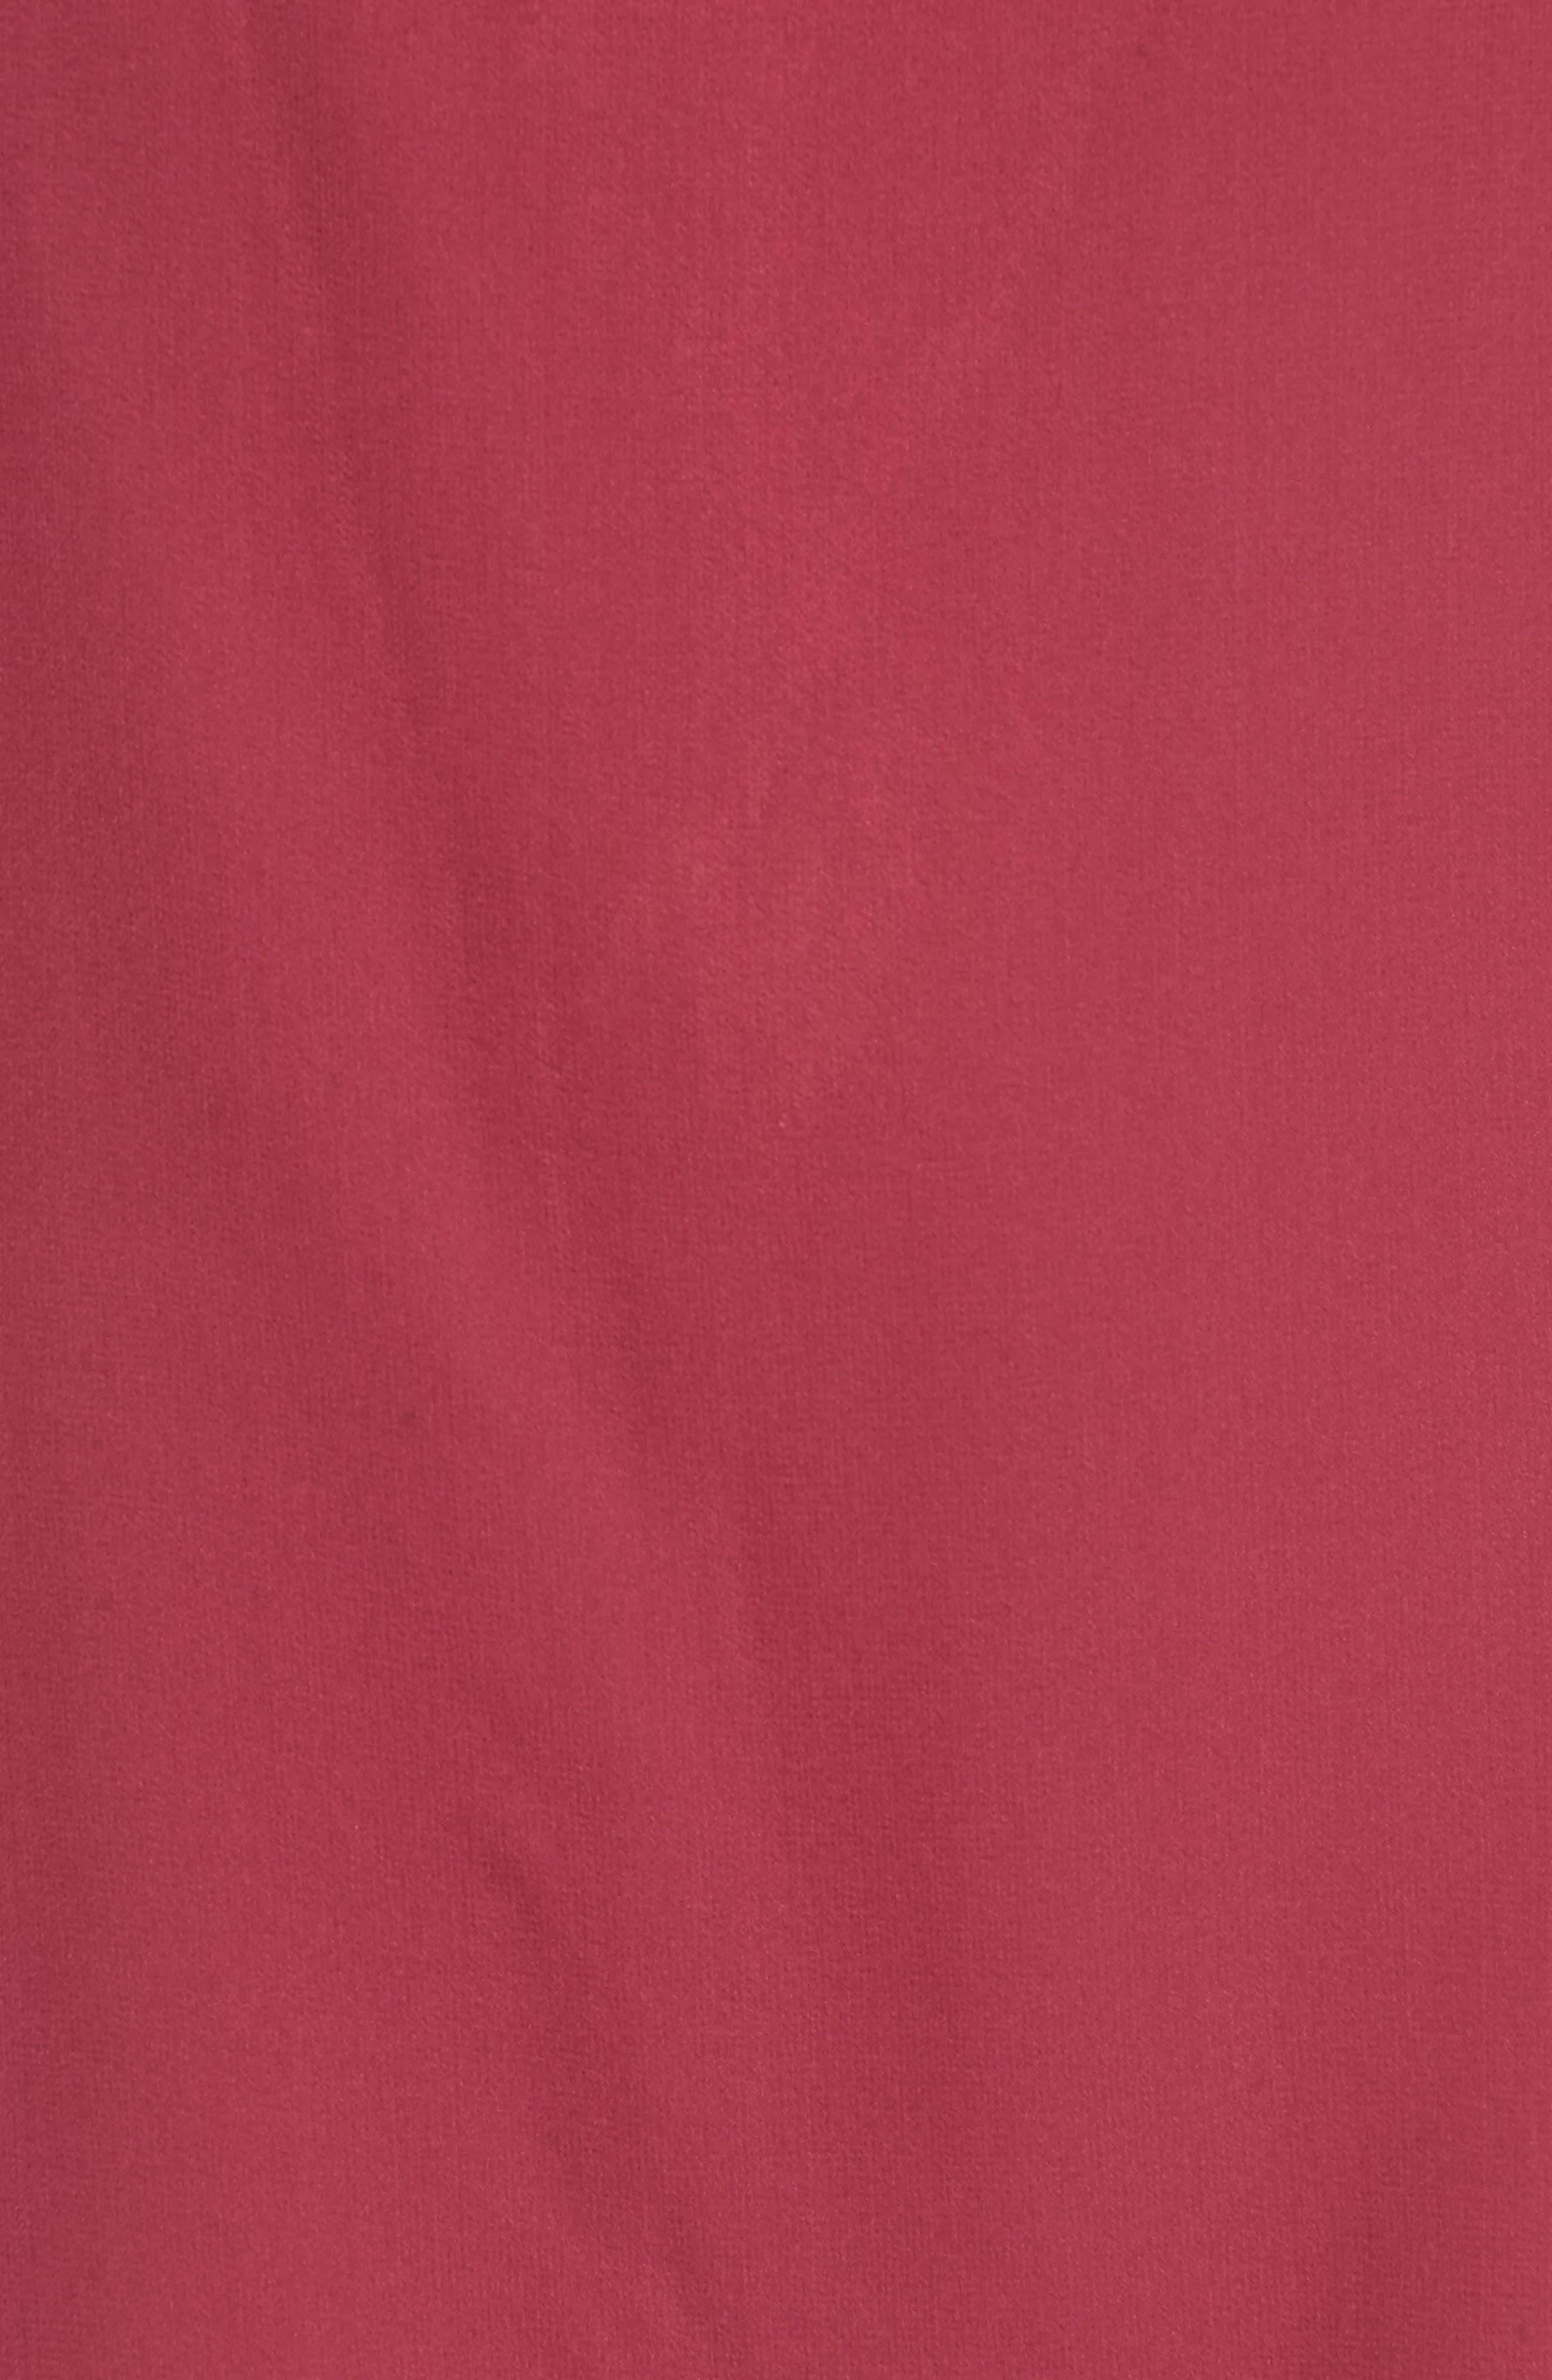 Dena Off the Shoulder Shift Dress,                             Alternate thumbnail 5, color,                             Raspberry